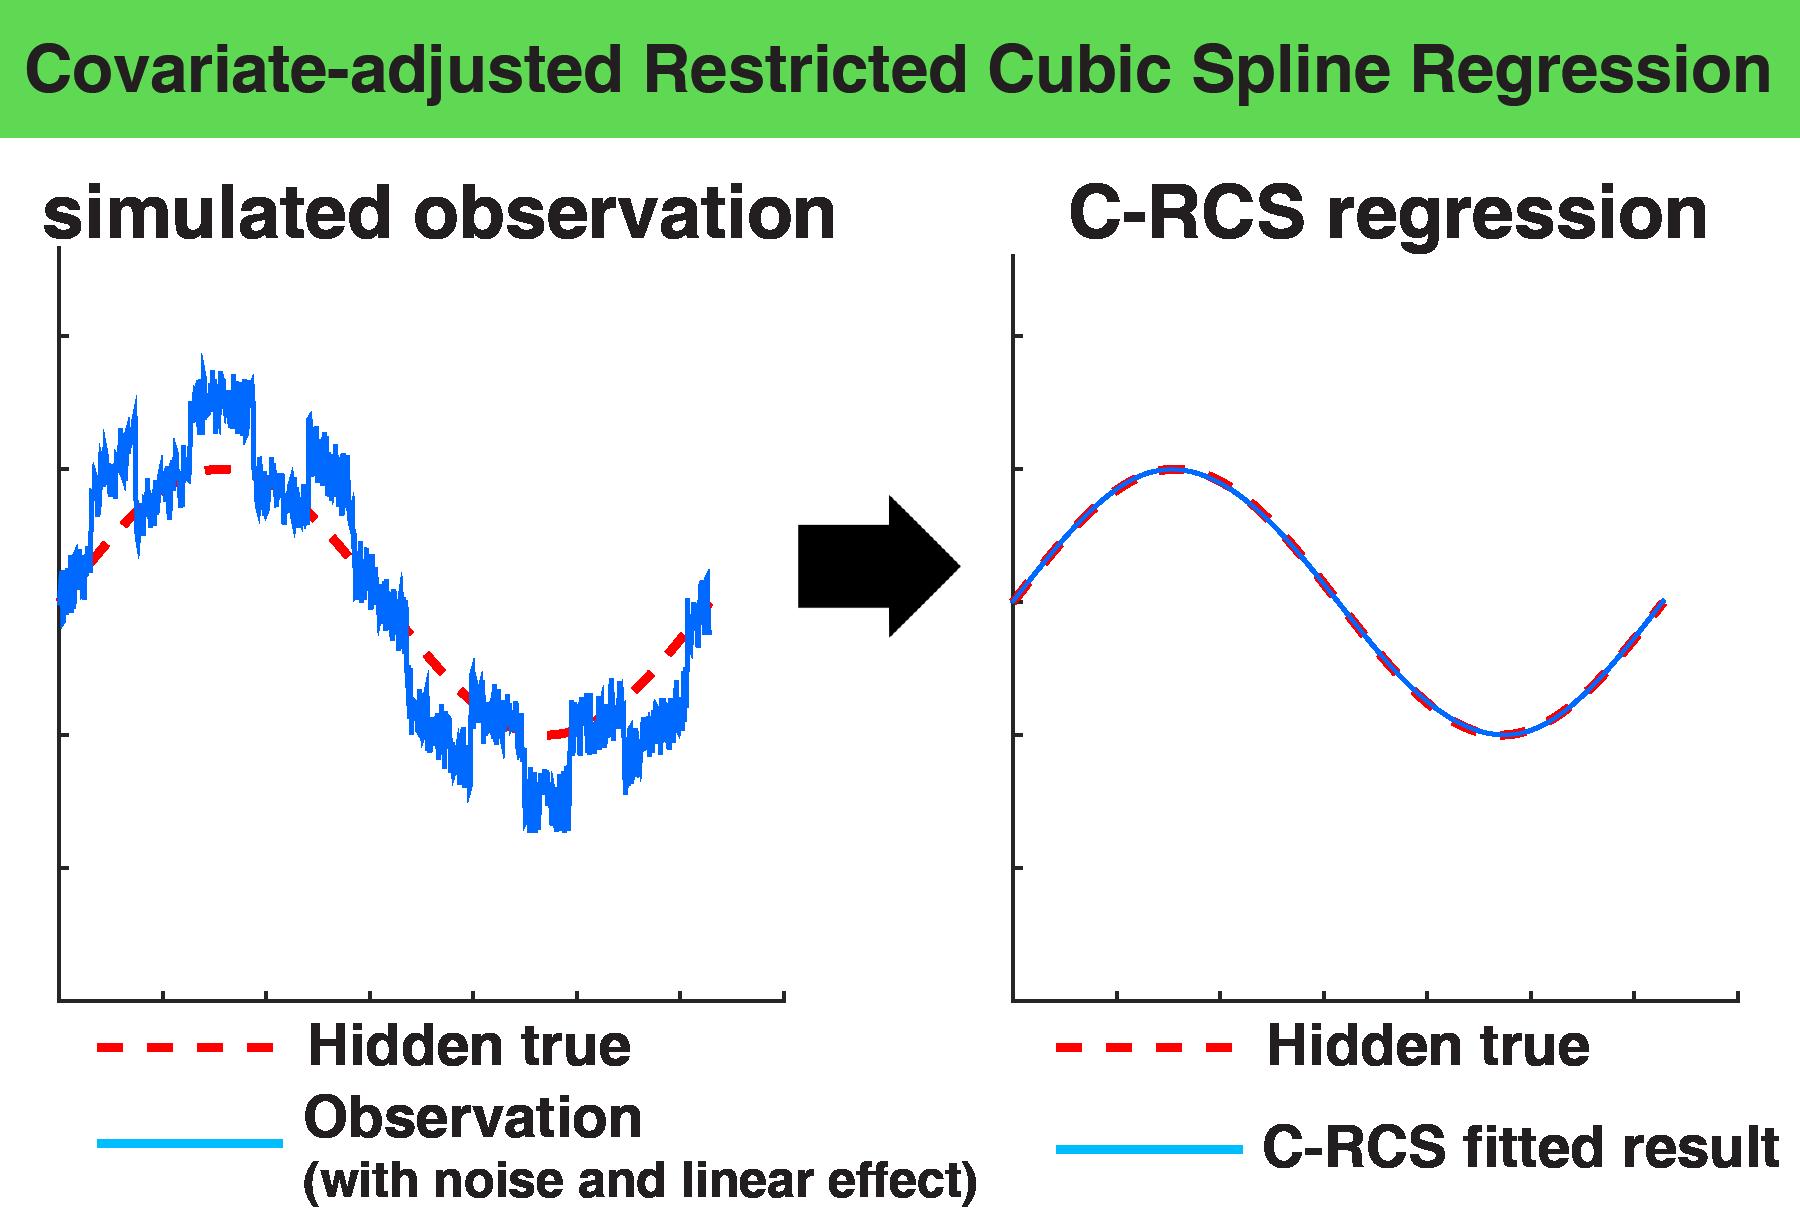 Covariate Adjusted Restricted Cubic Spline Regression